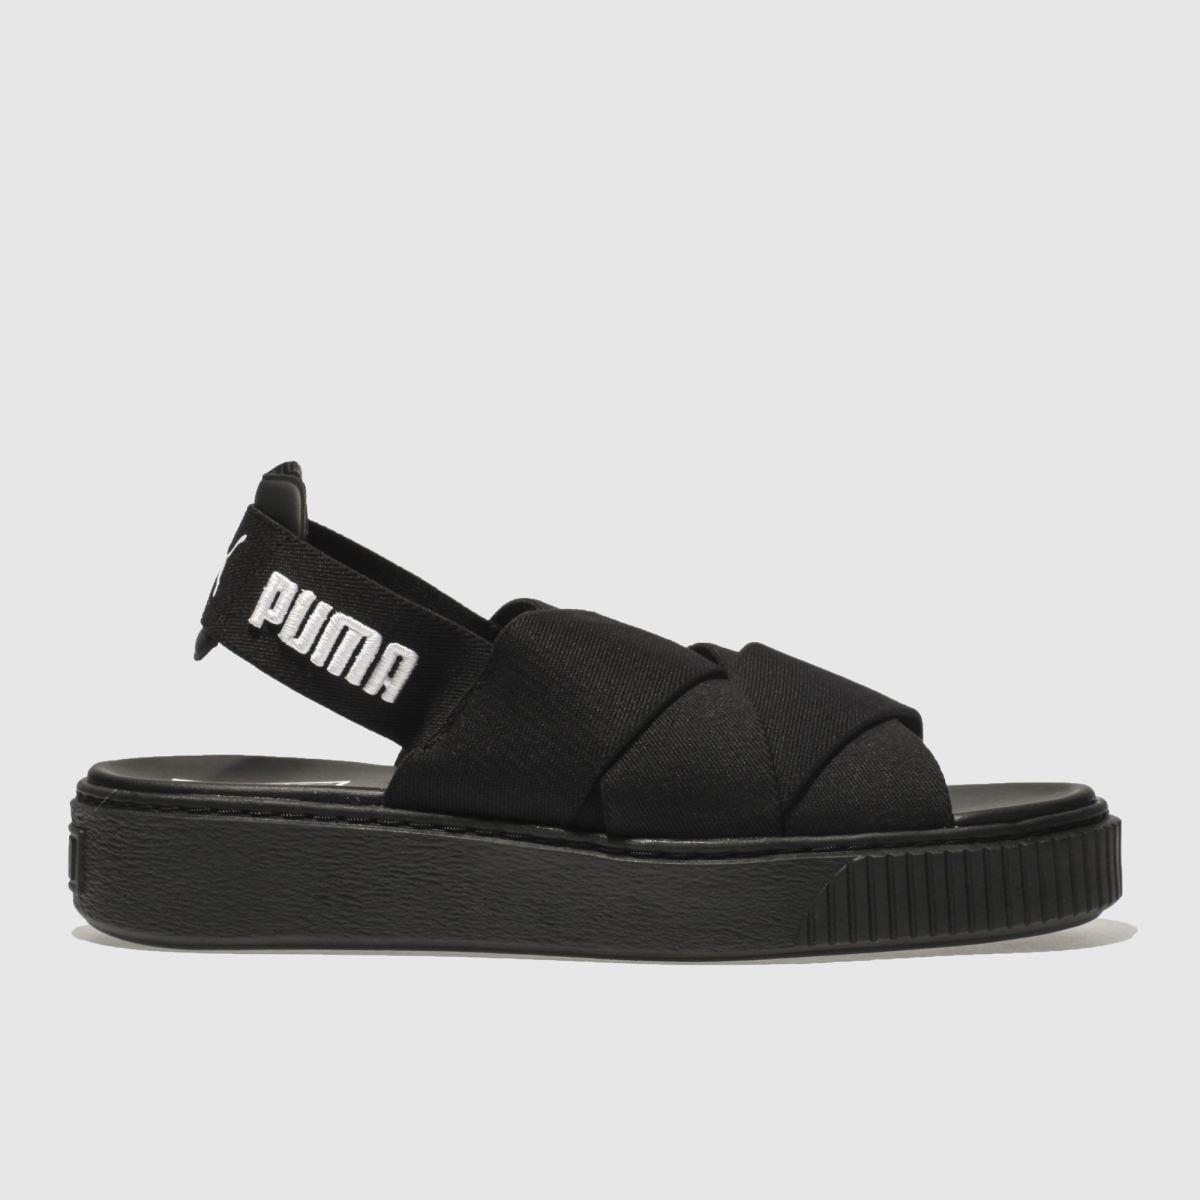 Puma Black Platform Sandal Sandals